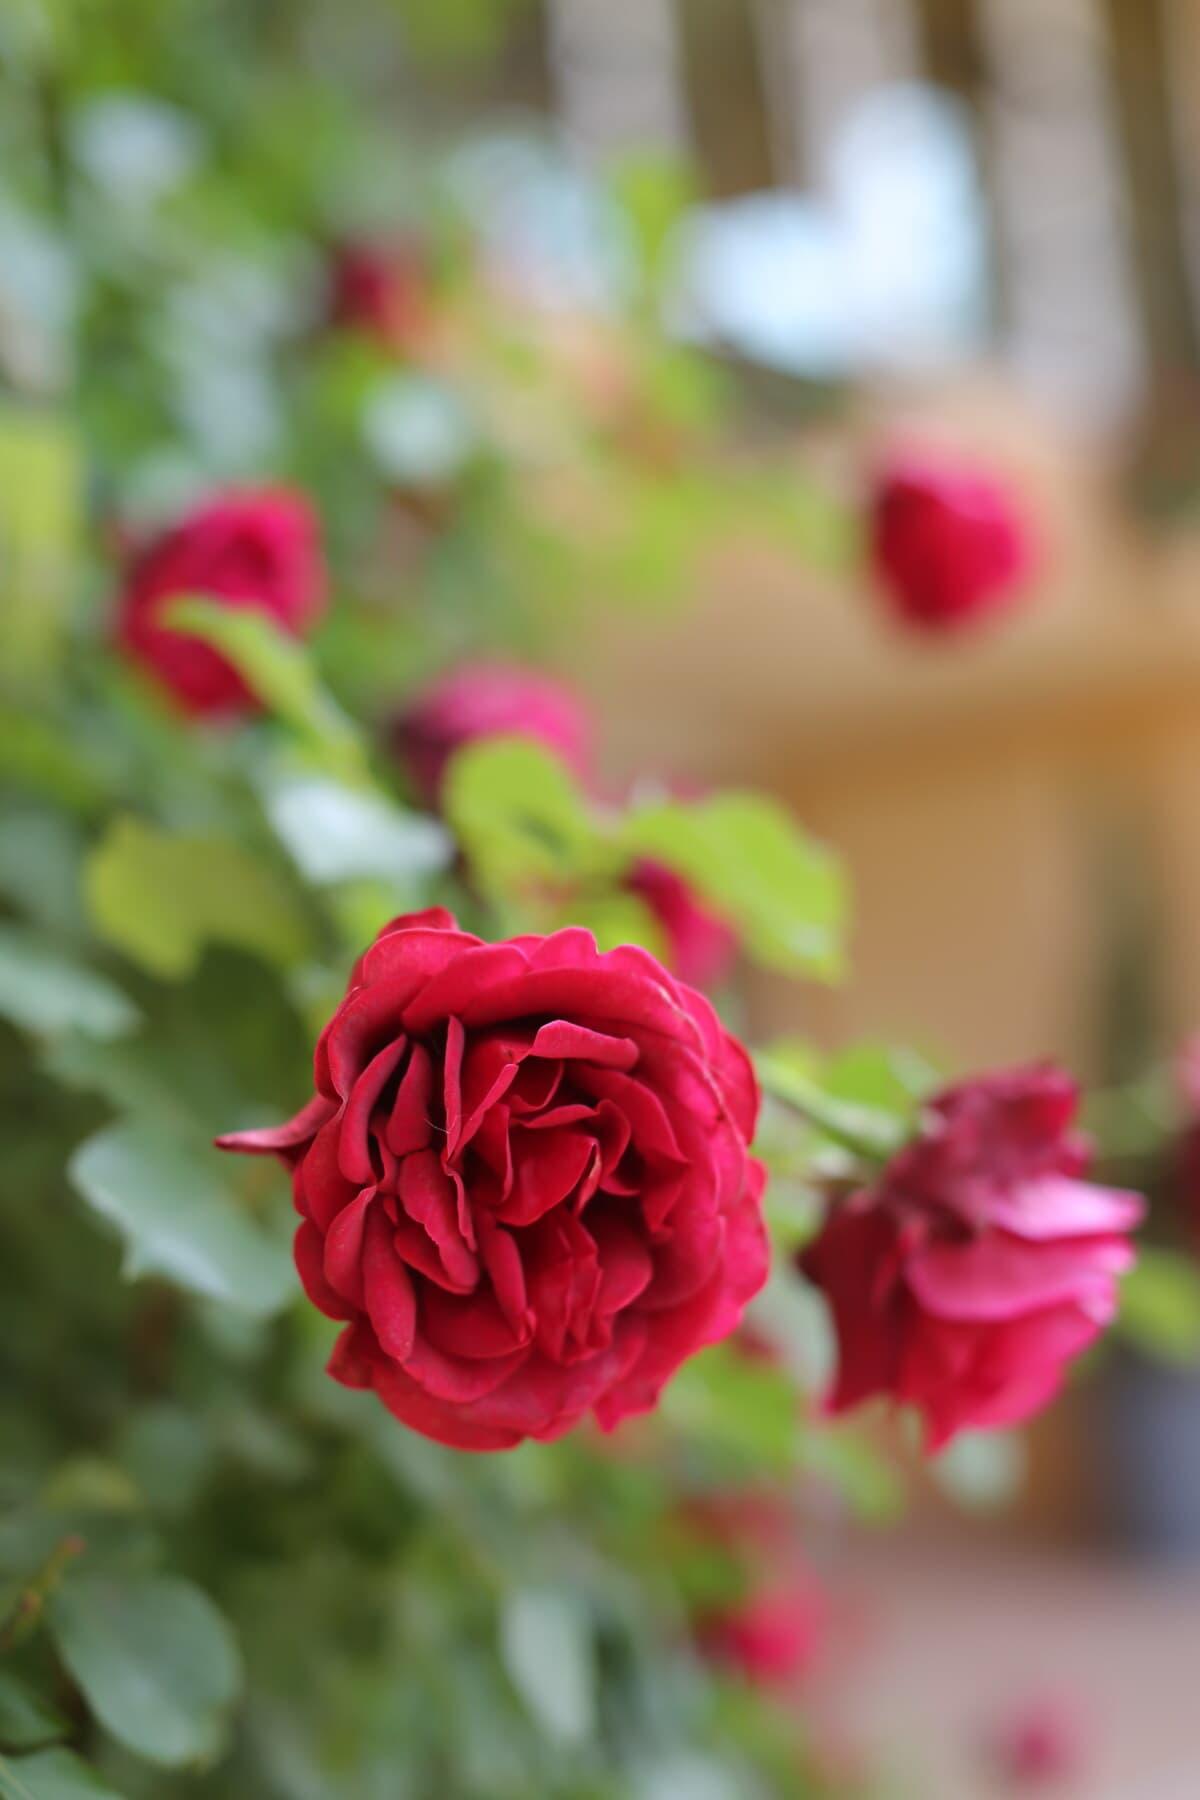 roses, focus, reddish, blurry, flower garden, rose, plant, petal, leaf, blossom